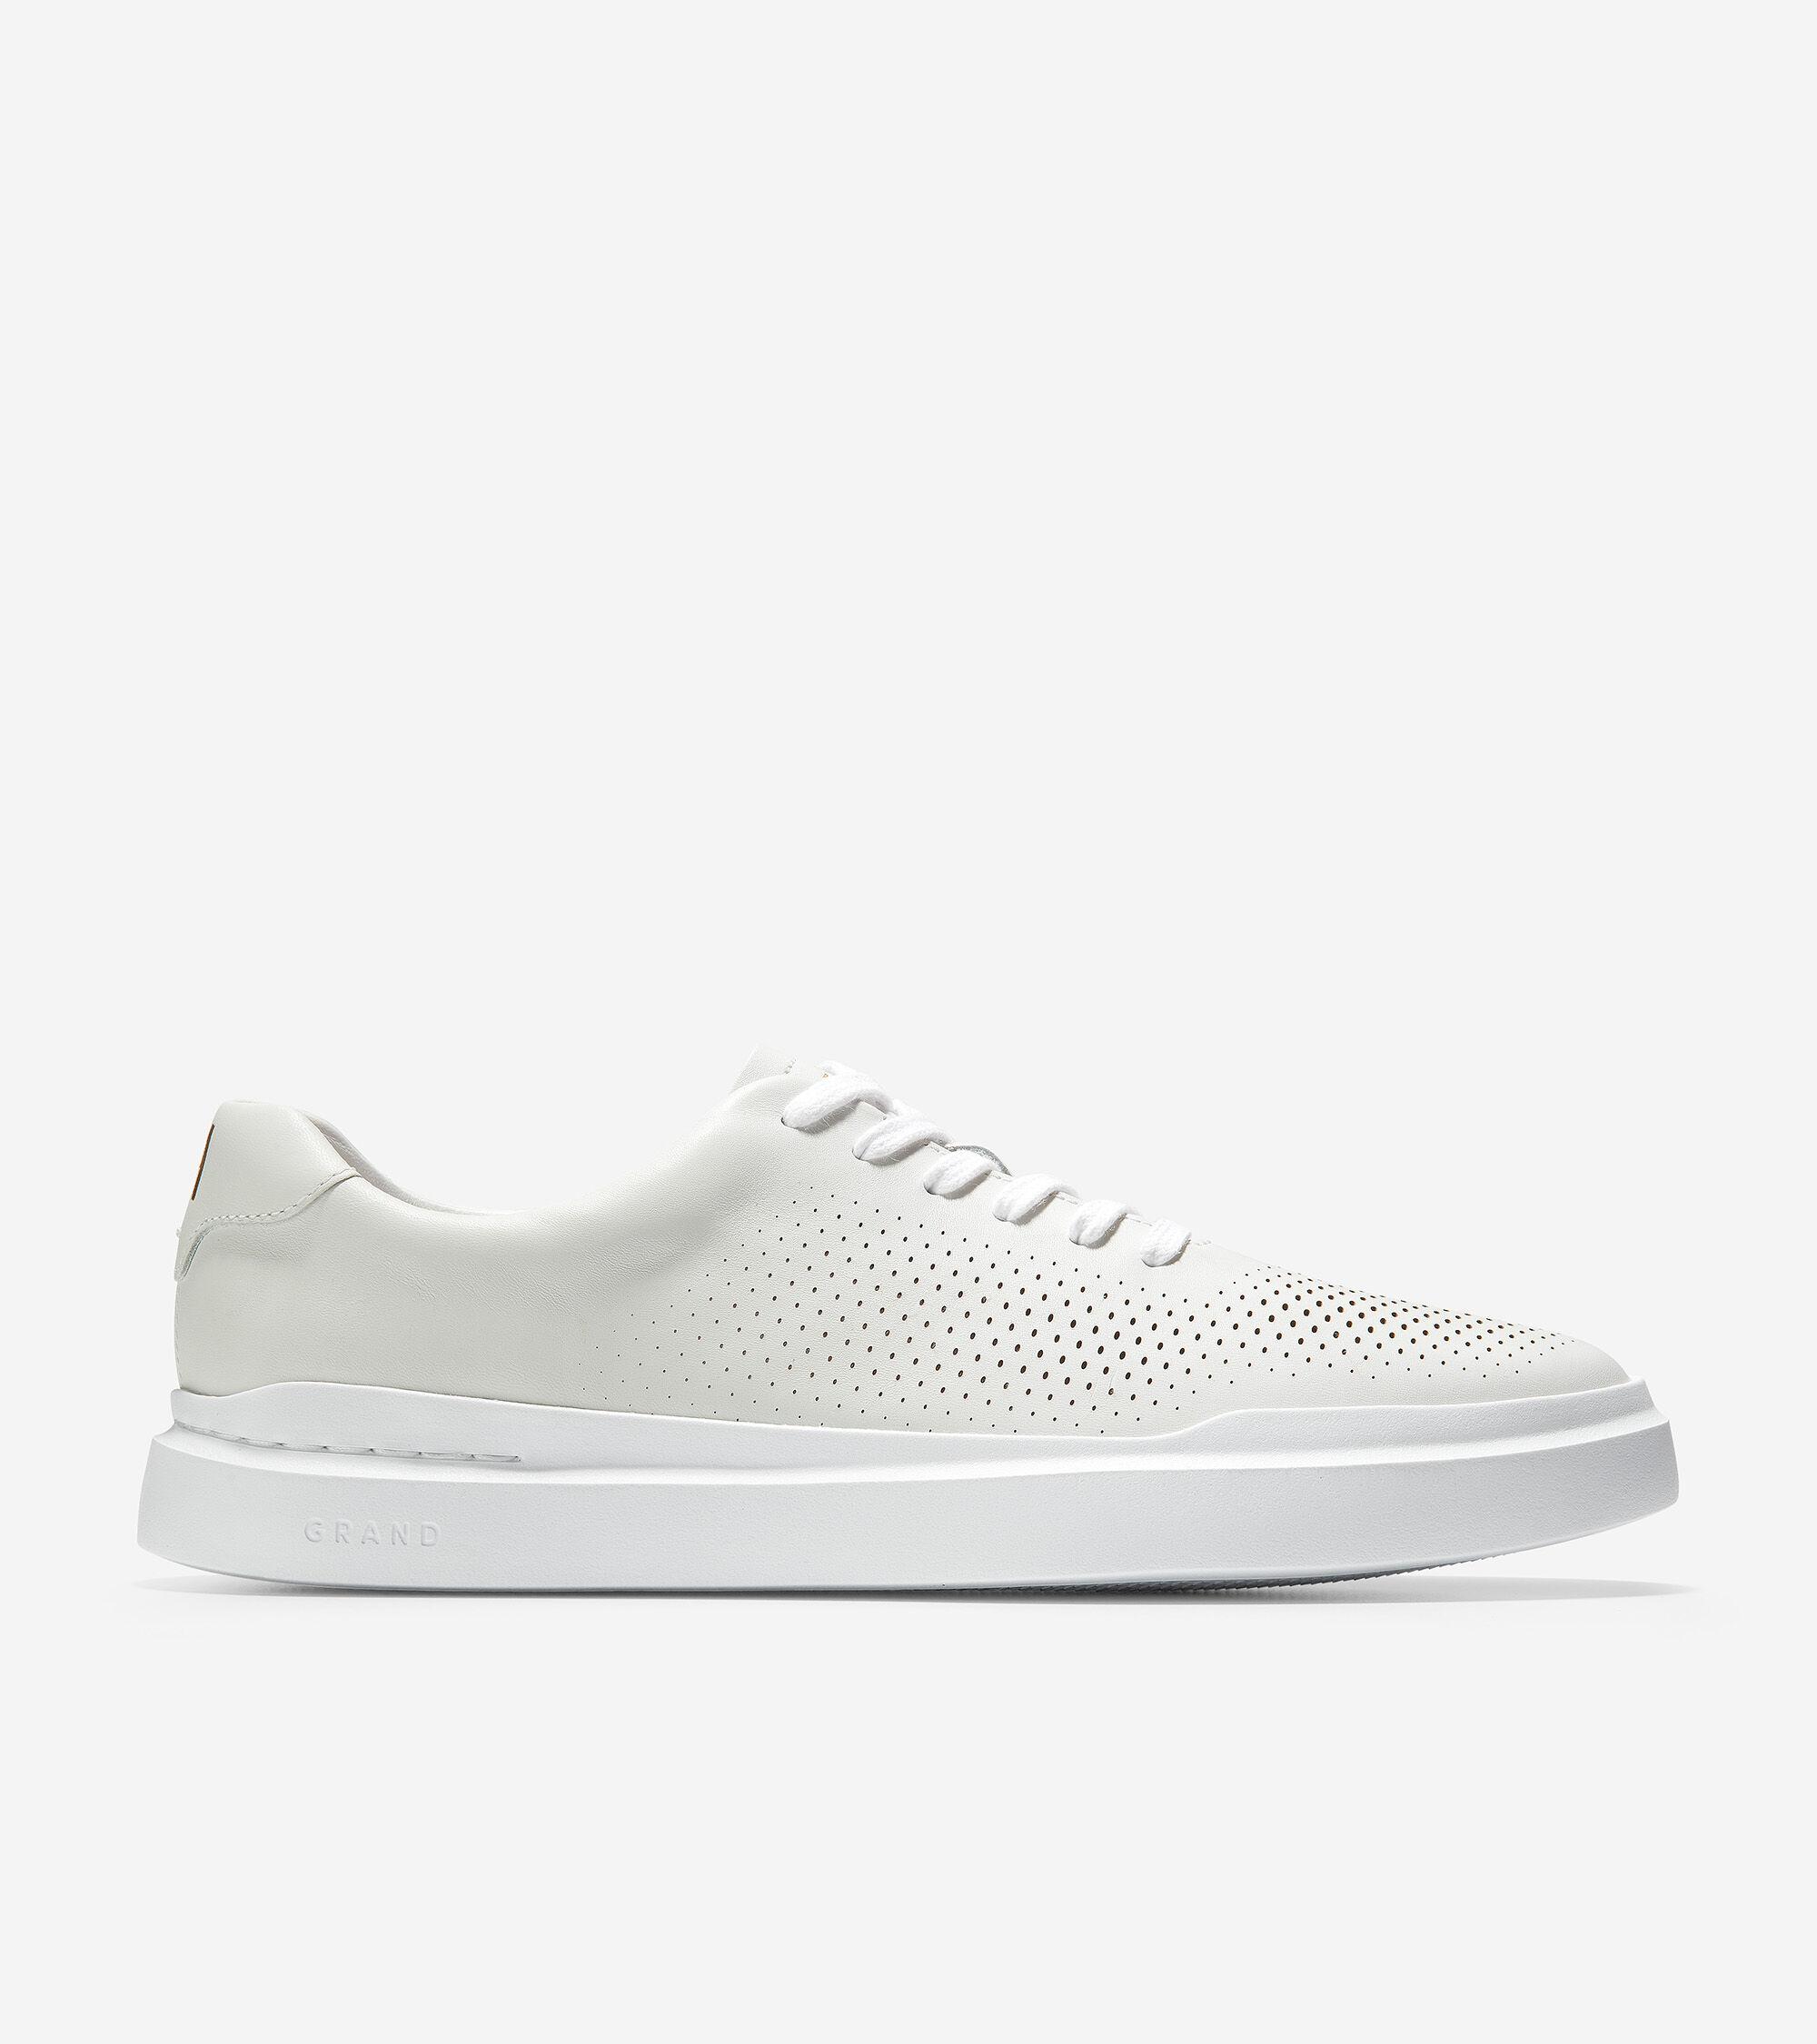 grandpr� rally laser cut sneaker womens platform white sneakers converse shoes & sneakers converse com